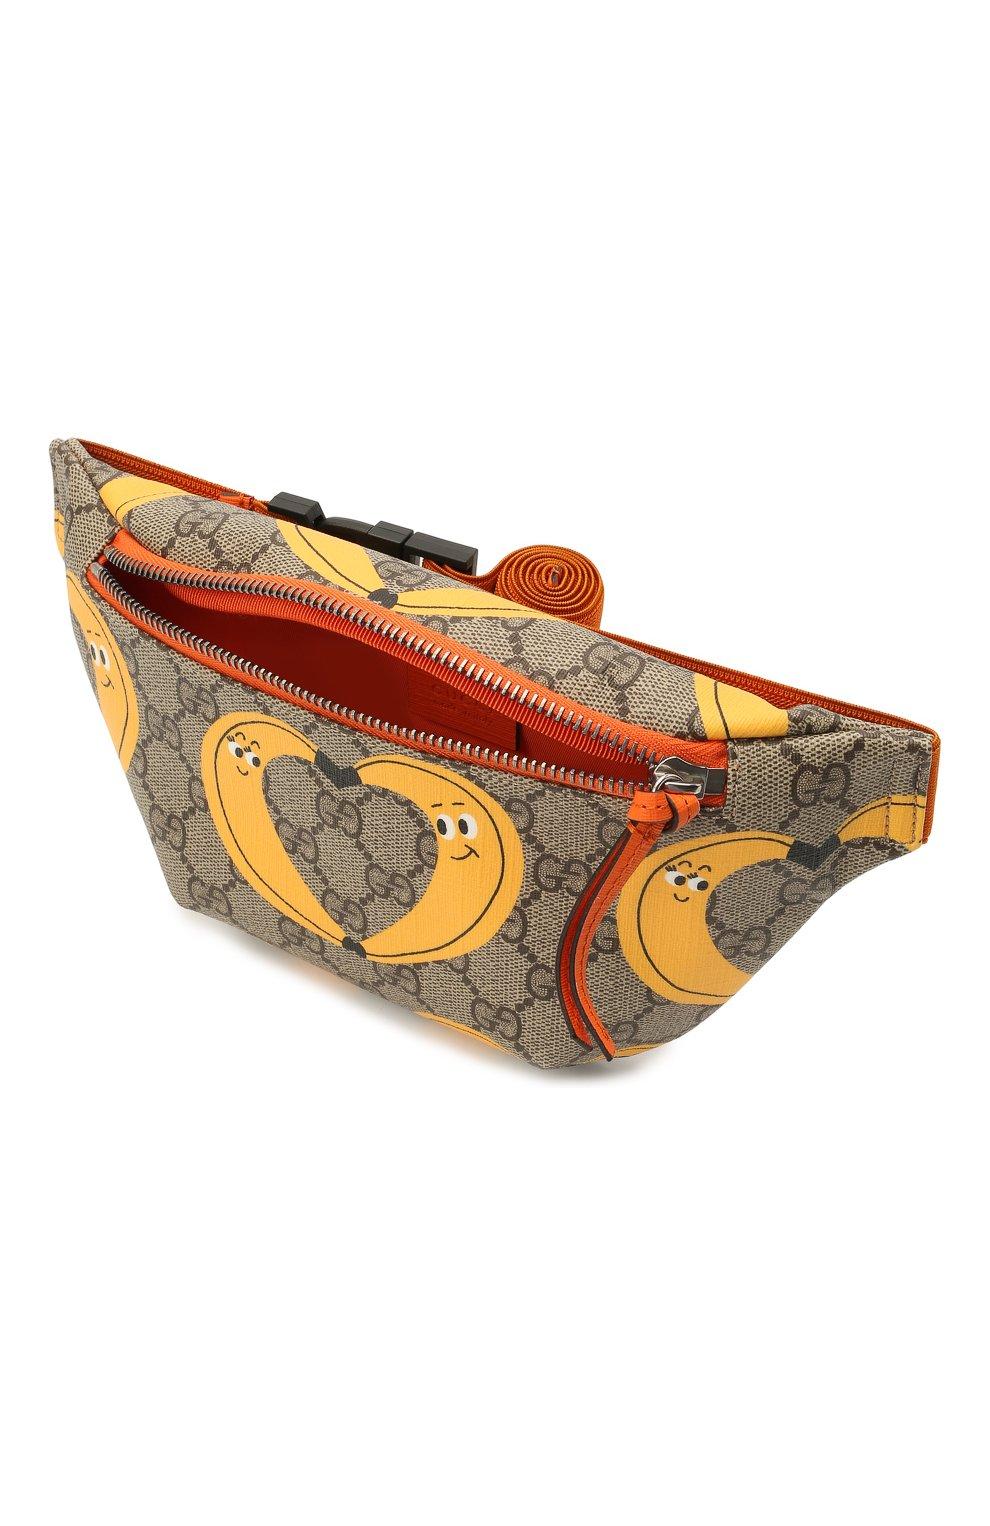 Детская поясная сумка GUCCI разноцветного цвета, арт. 502095/22DDN | Фото 3 (Материал: Экокожа)